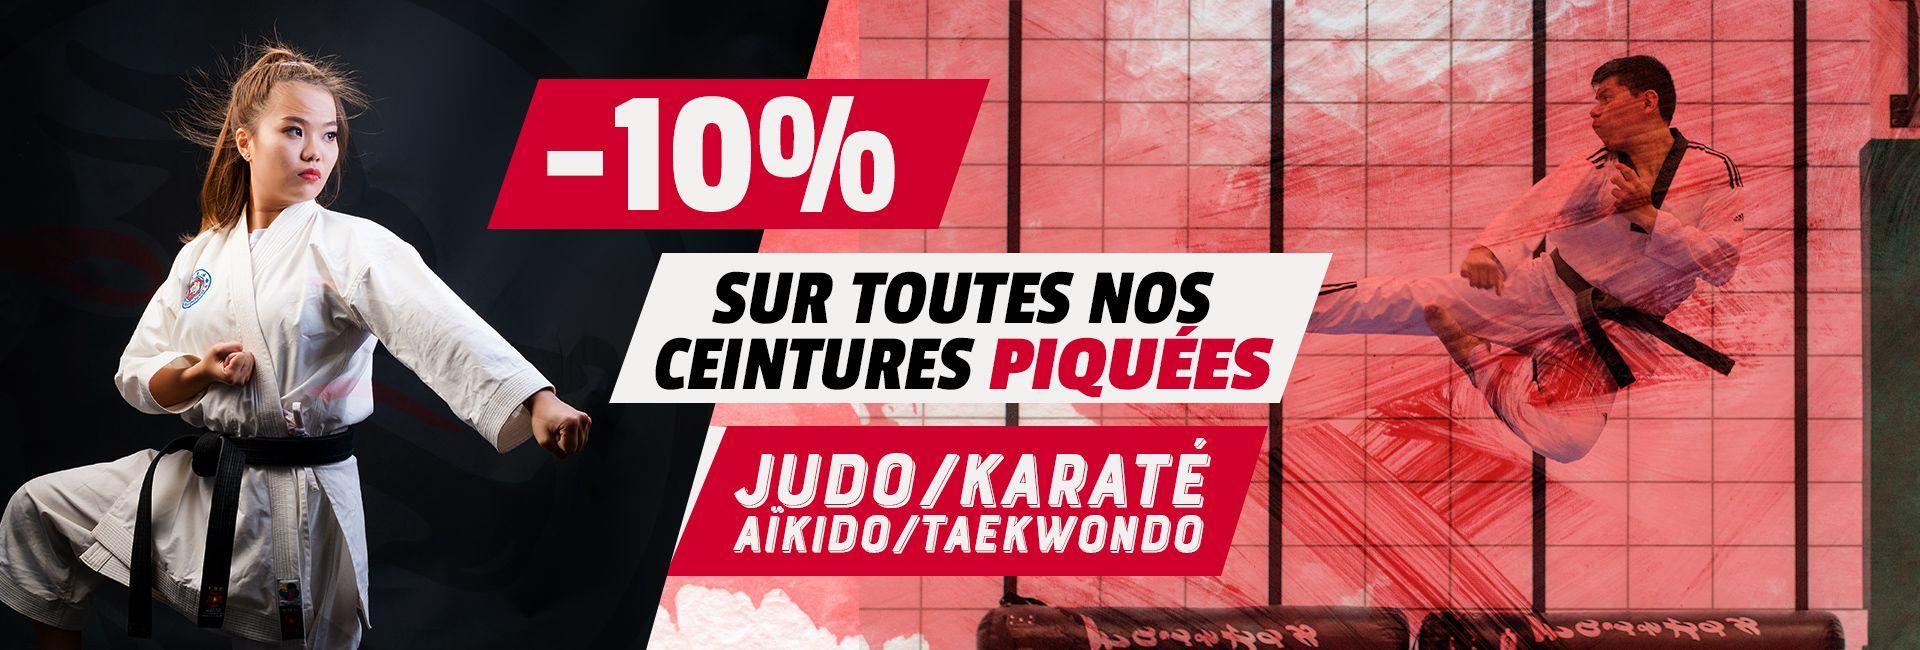 -10% sur toutes nos ceintures piquées Judo, Karaté, Aikido, Taekwondo